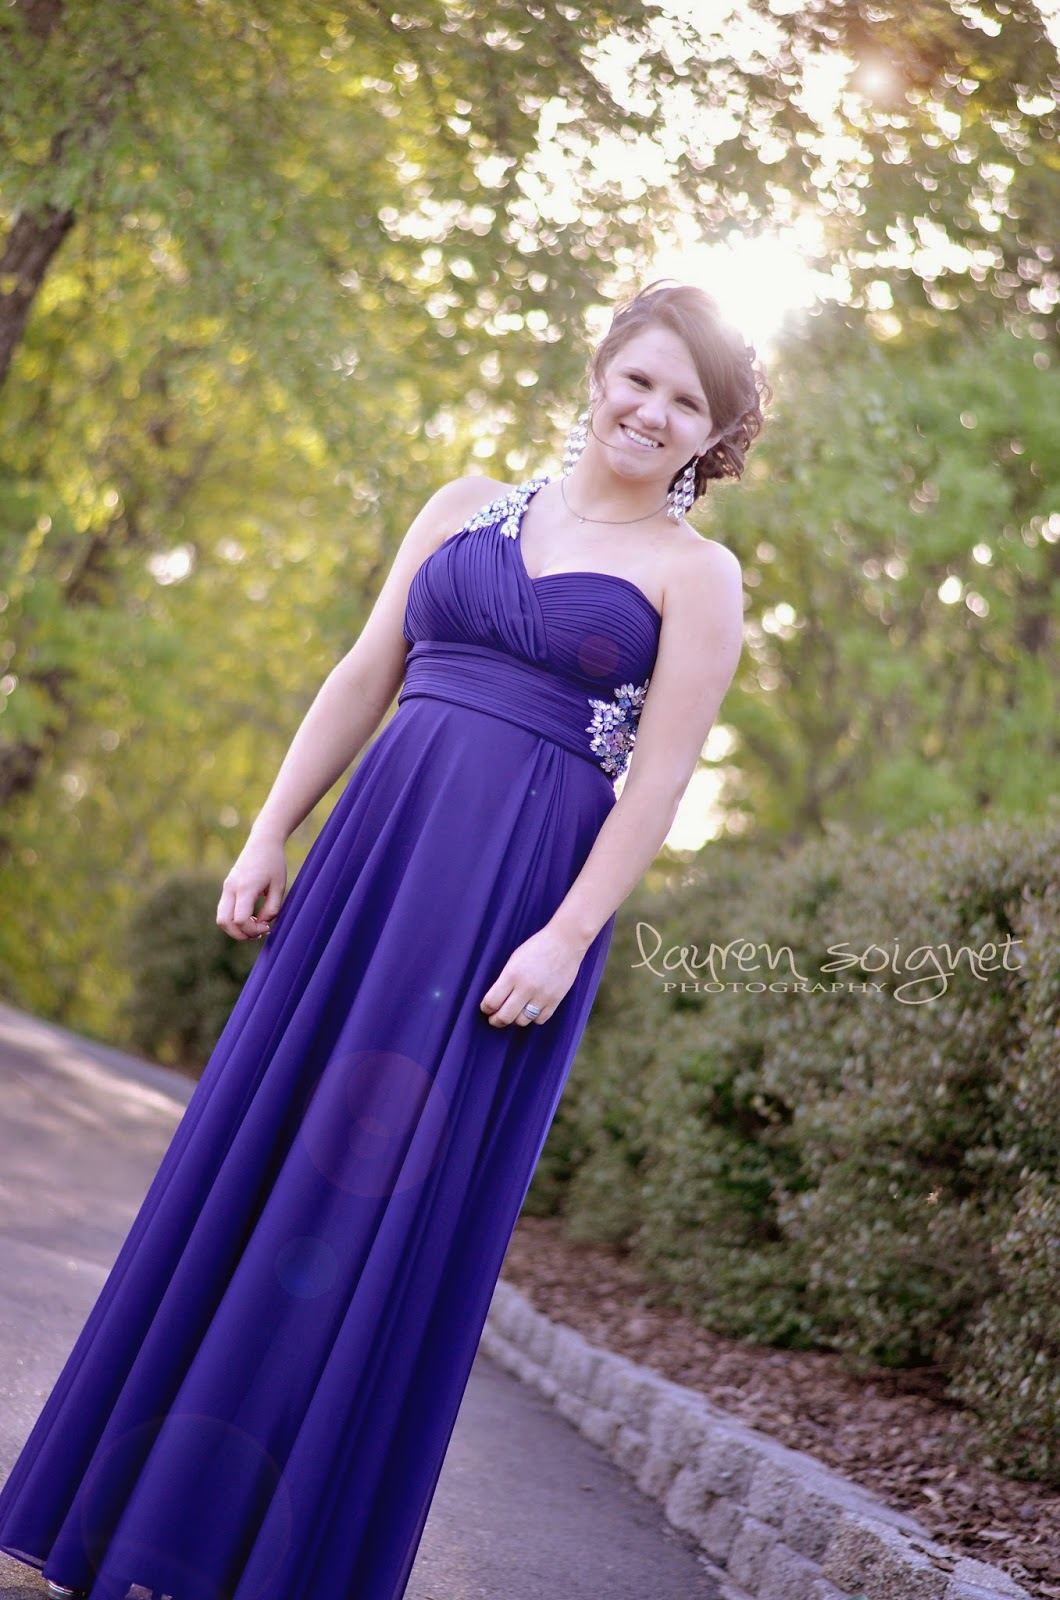 Prom dresses durham nc vosoi lauren soignet photography northern high school prom summer ombrellifo Choice Image